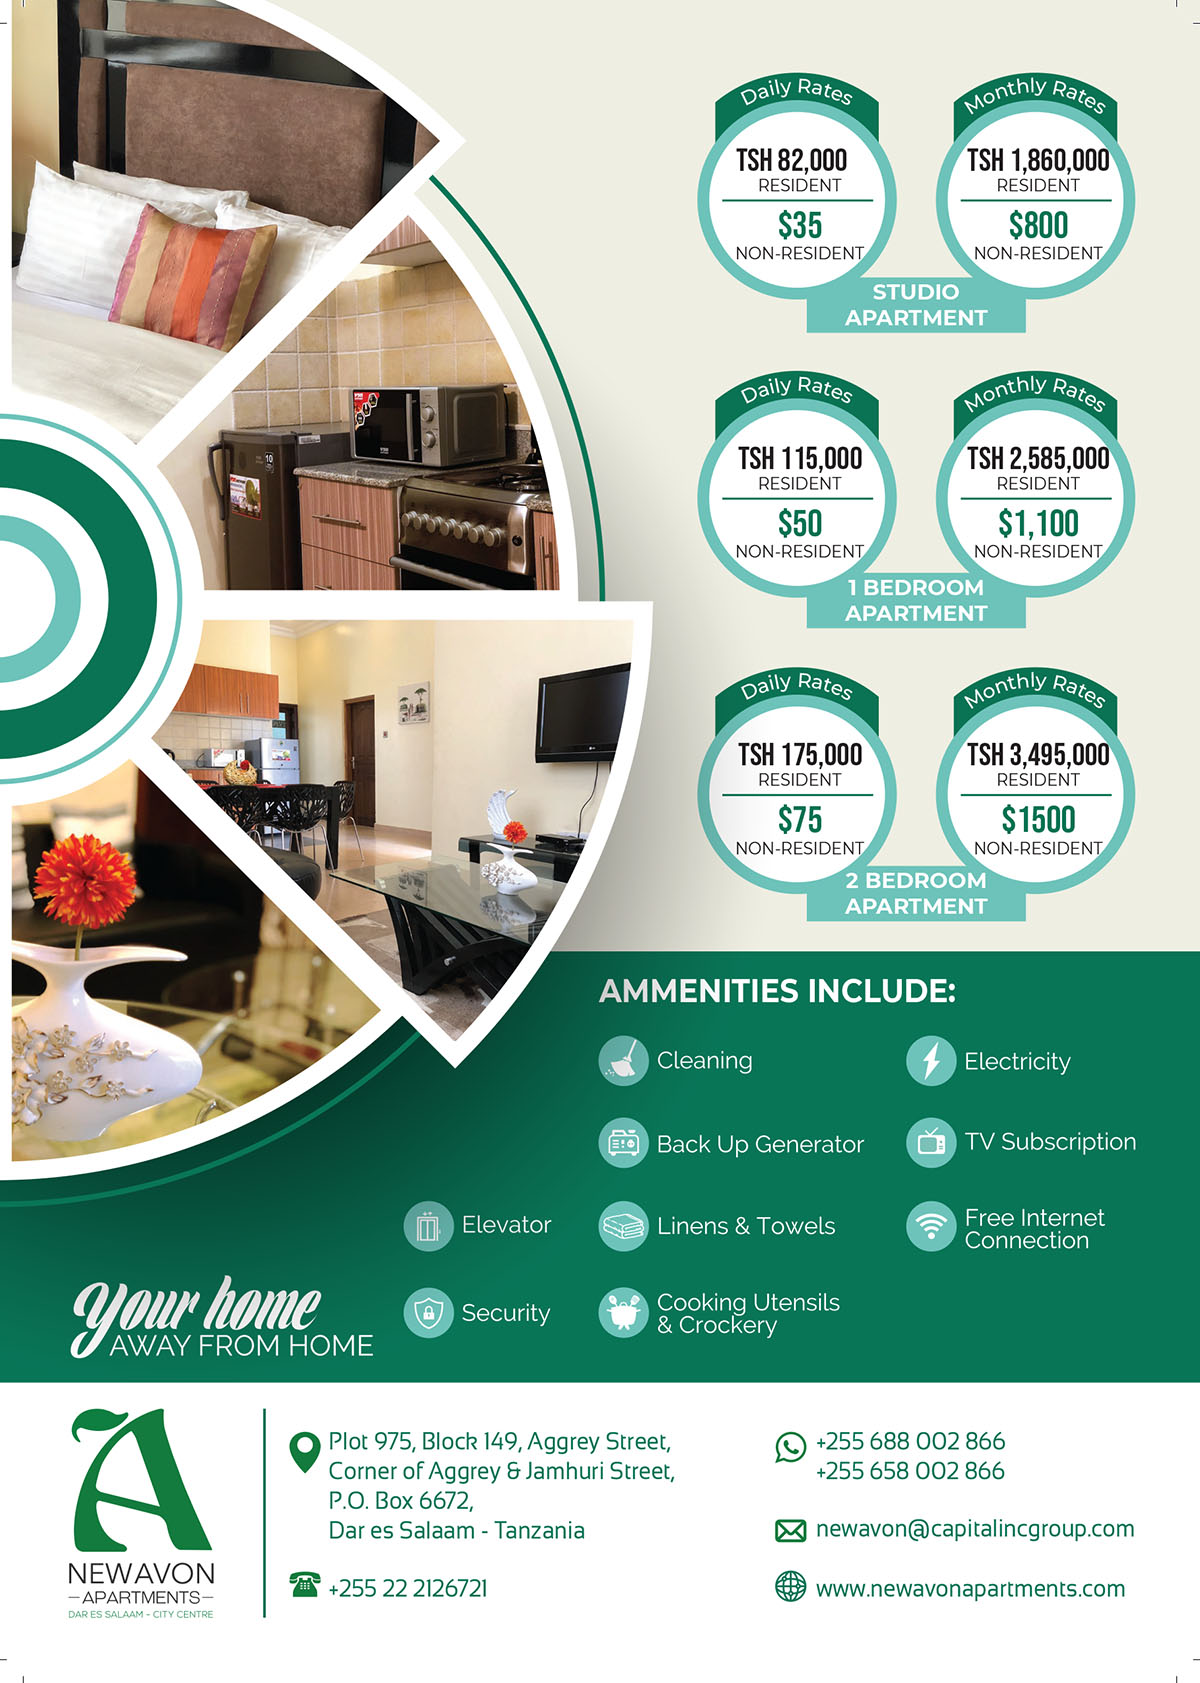 New Avon Apartments Accommodation rates